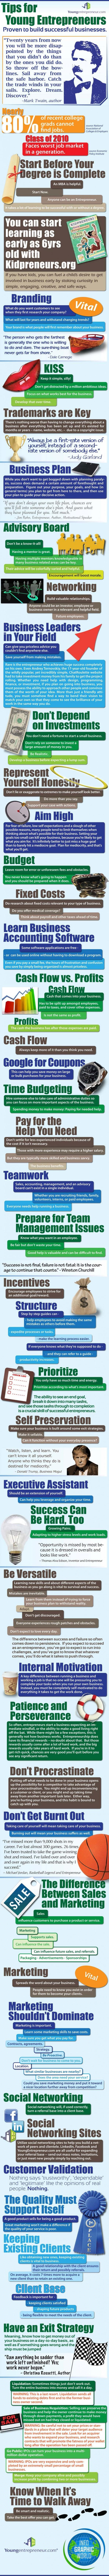 Tips For Young Entrepreneurs #infographic // Consejos Para Jóvenes Emprendedores #infografia (repinned by @ricardollera)